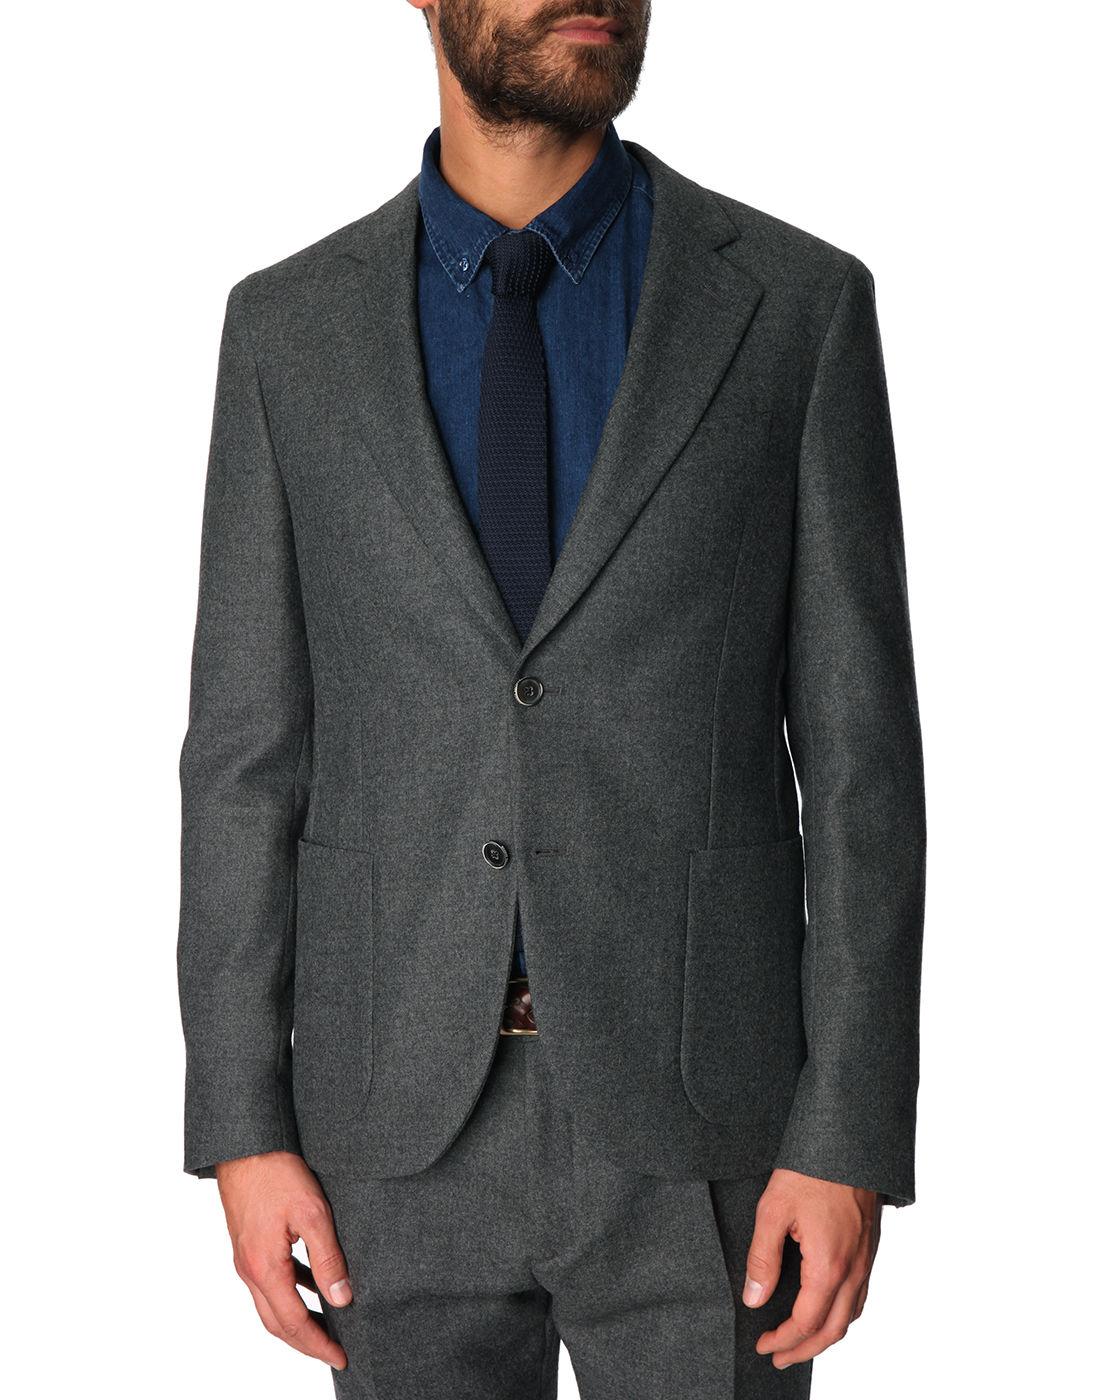 Atelier scotch slim fit grey wool suit integrated pouch for Atelier maison scotch